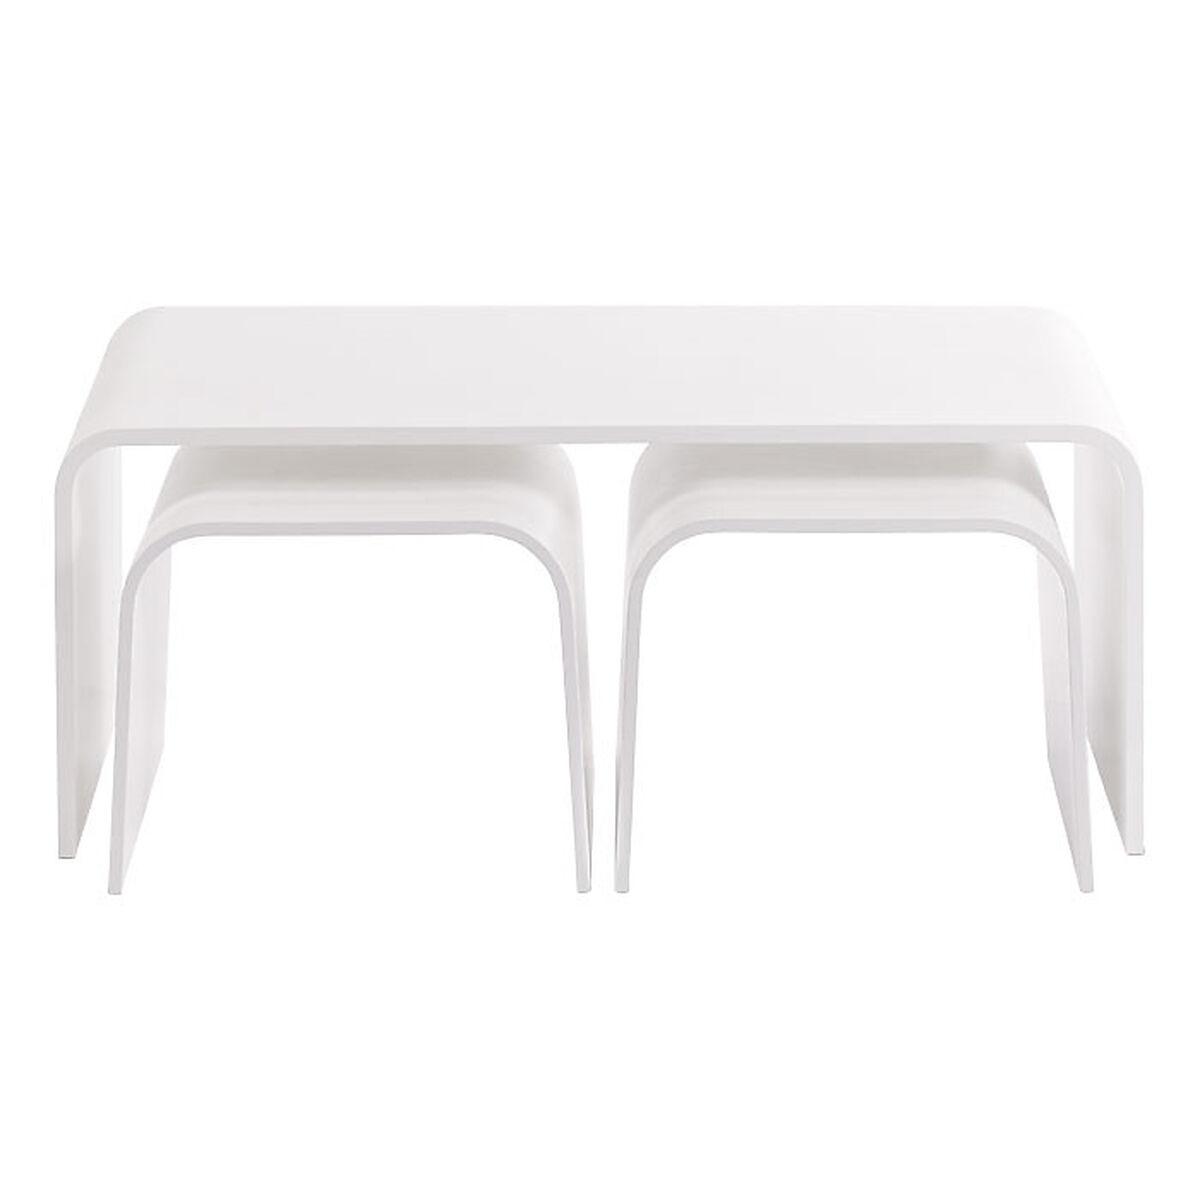 couchtisch 3er set weiss depot de. Black Bedroom Furniture Sets. Home Design Ideas